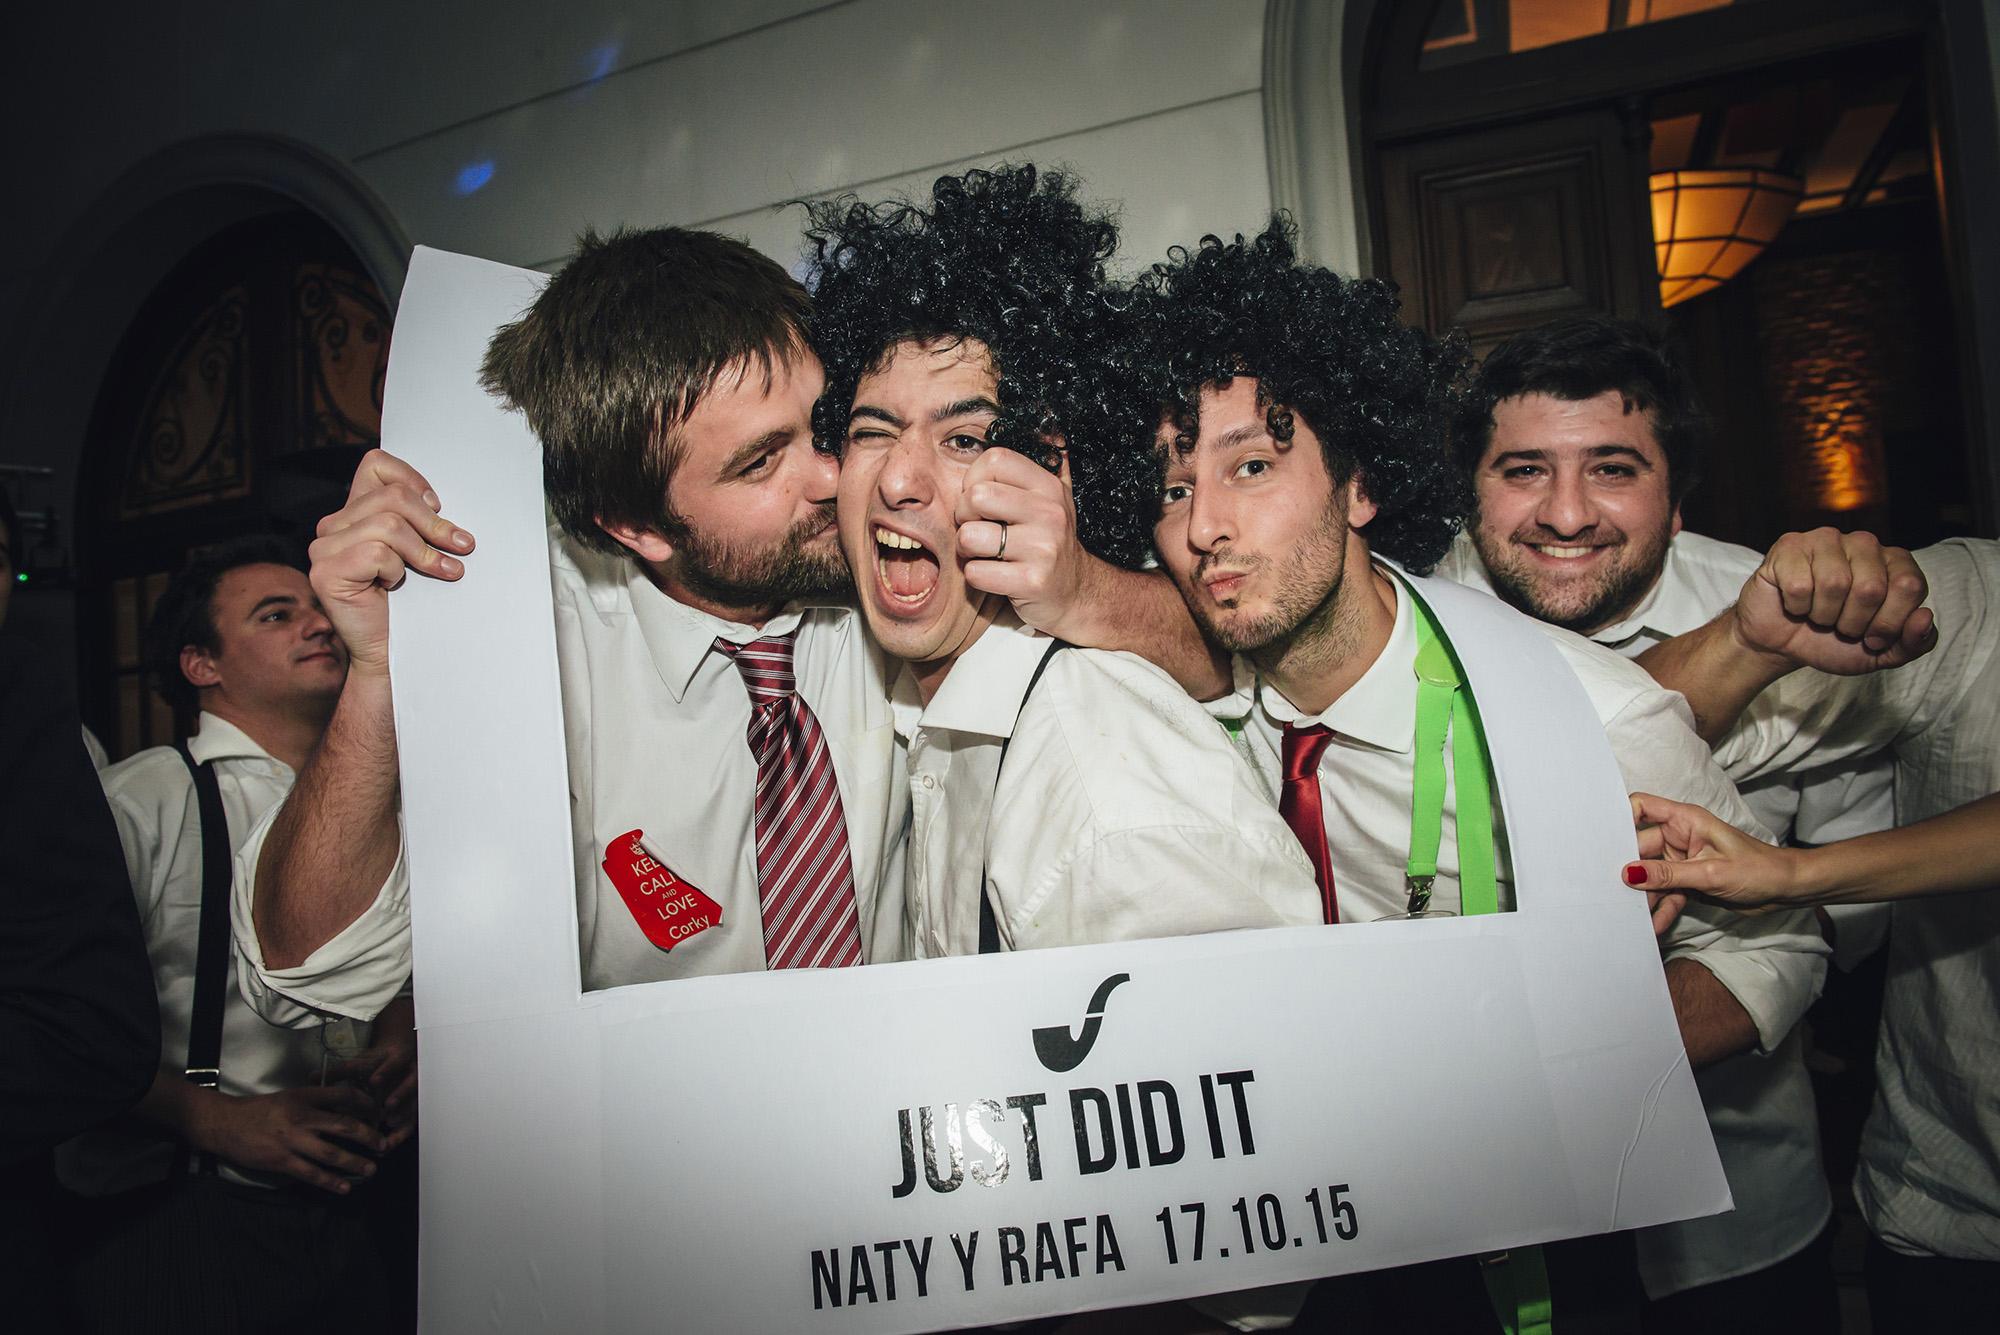 patricia-riba-casamiento-montevideo-uruguay-lindolfo-76